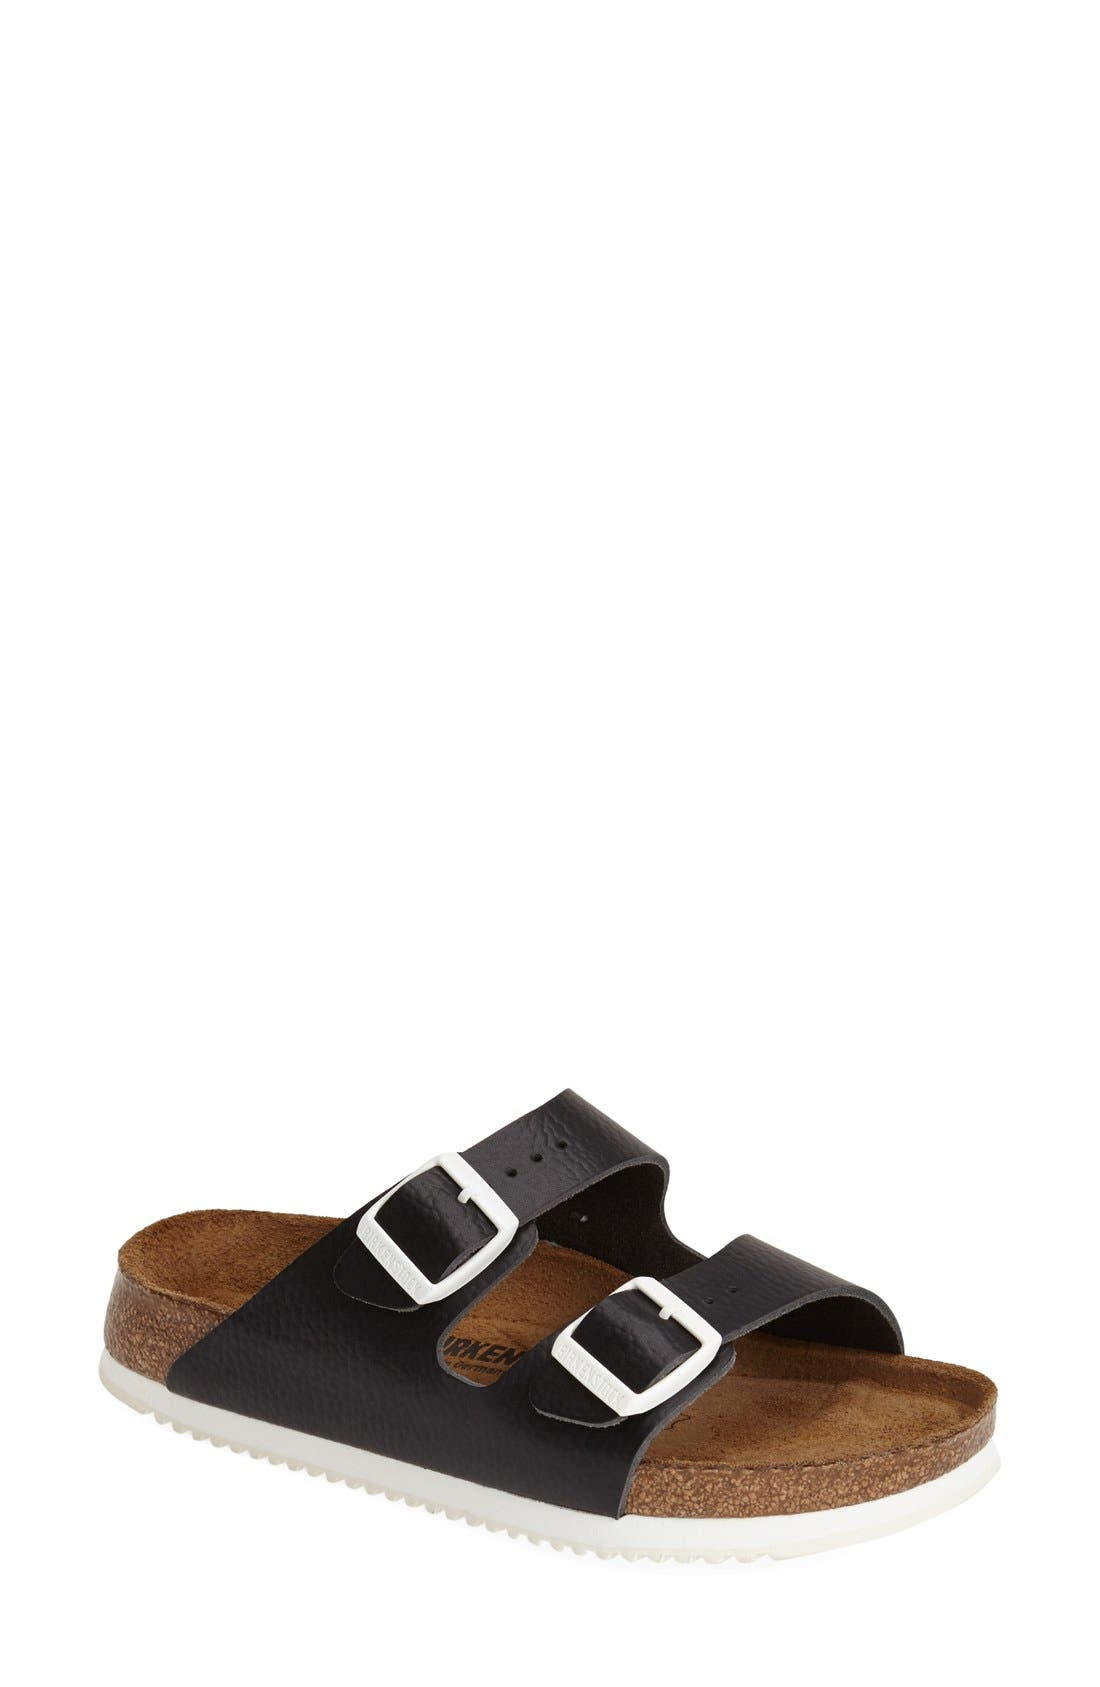 BIRKENSTOCK 'Arizona' Leather Double Band Footbed Sandal, Main, color, 001